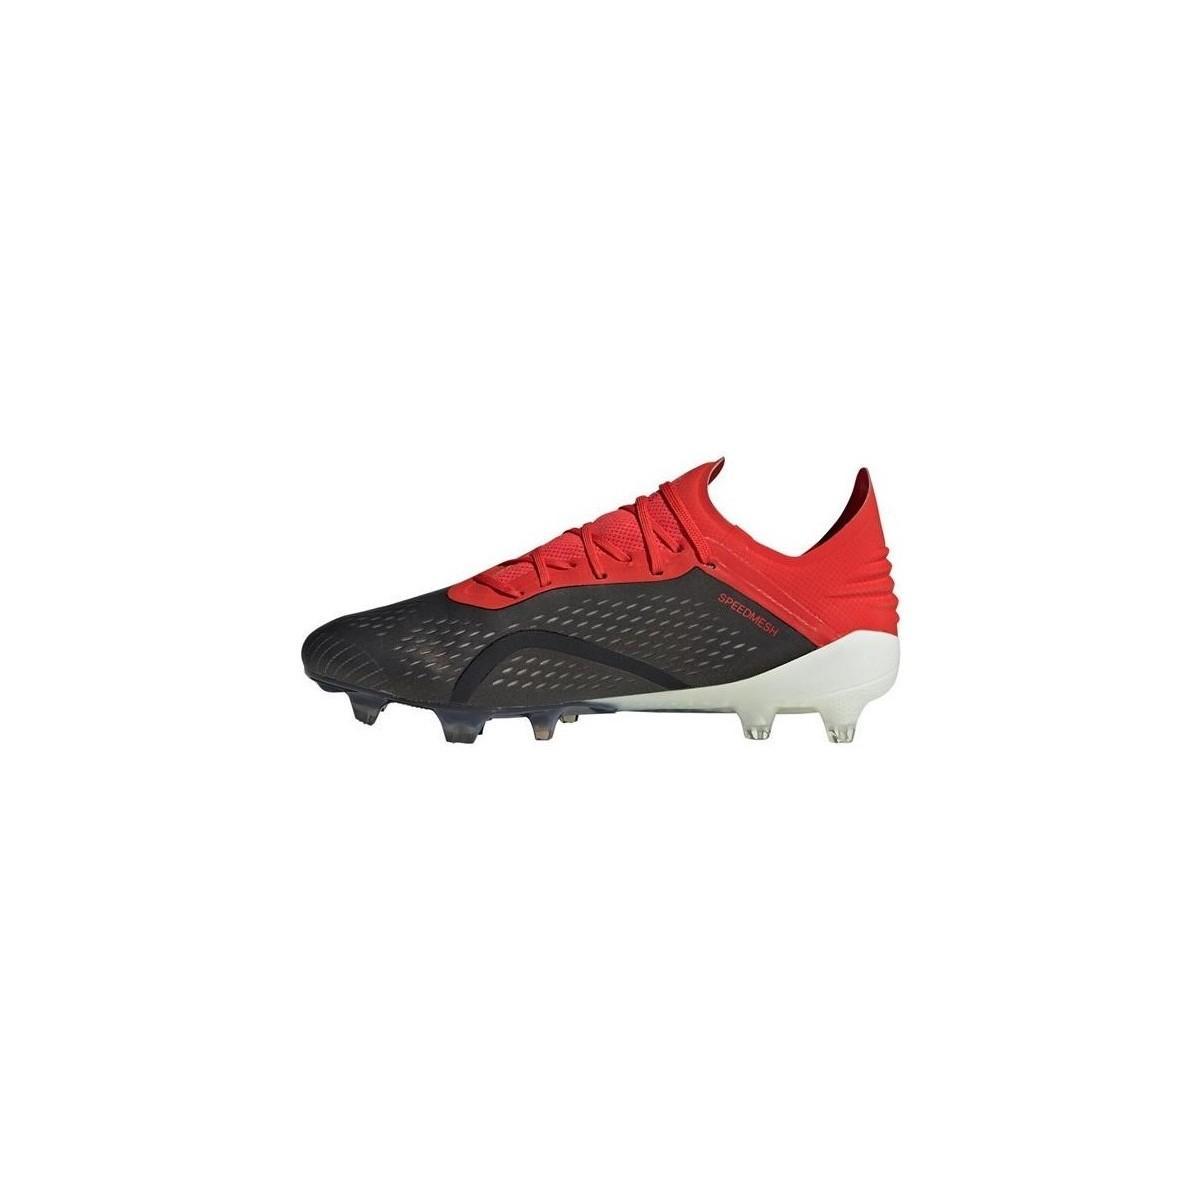 853b3b907d9 Adidas - X 181 Fg Men s Football Boots In Black for Men - Lyst. View  fullscreen